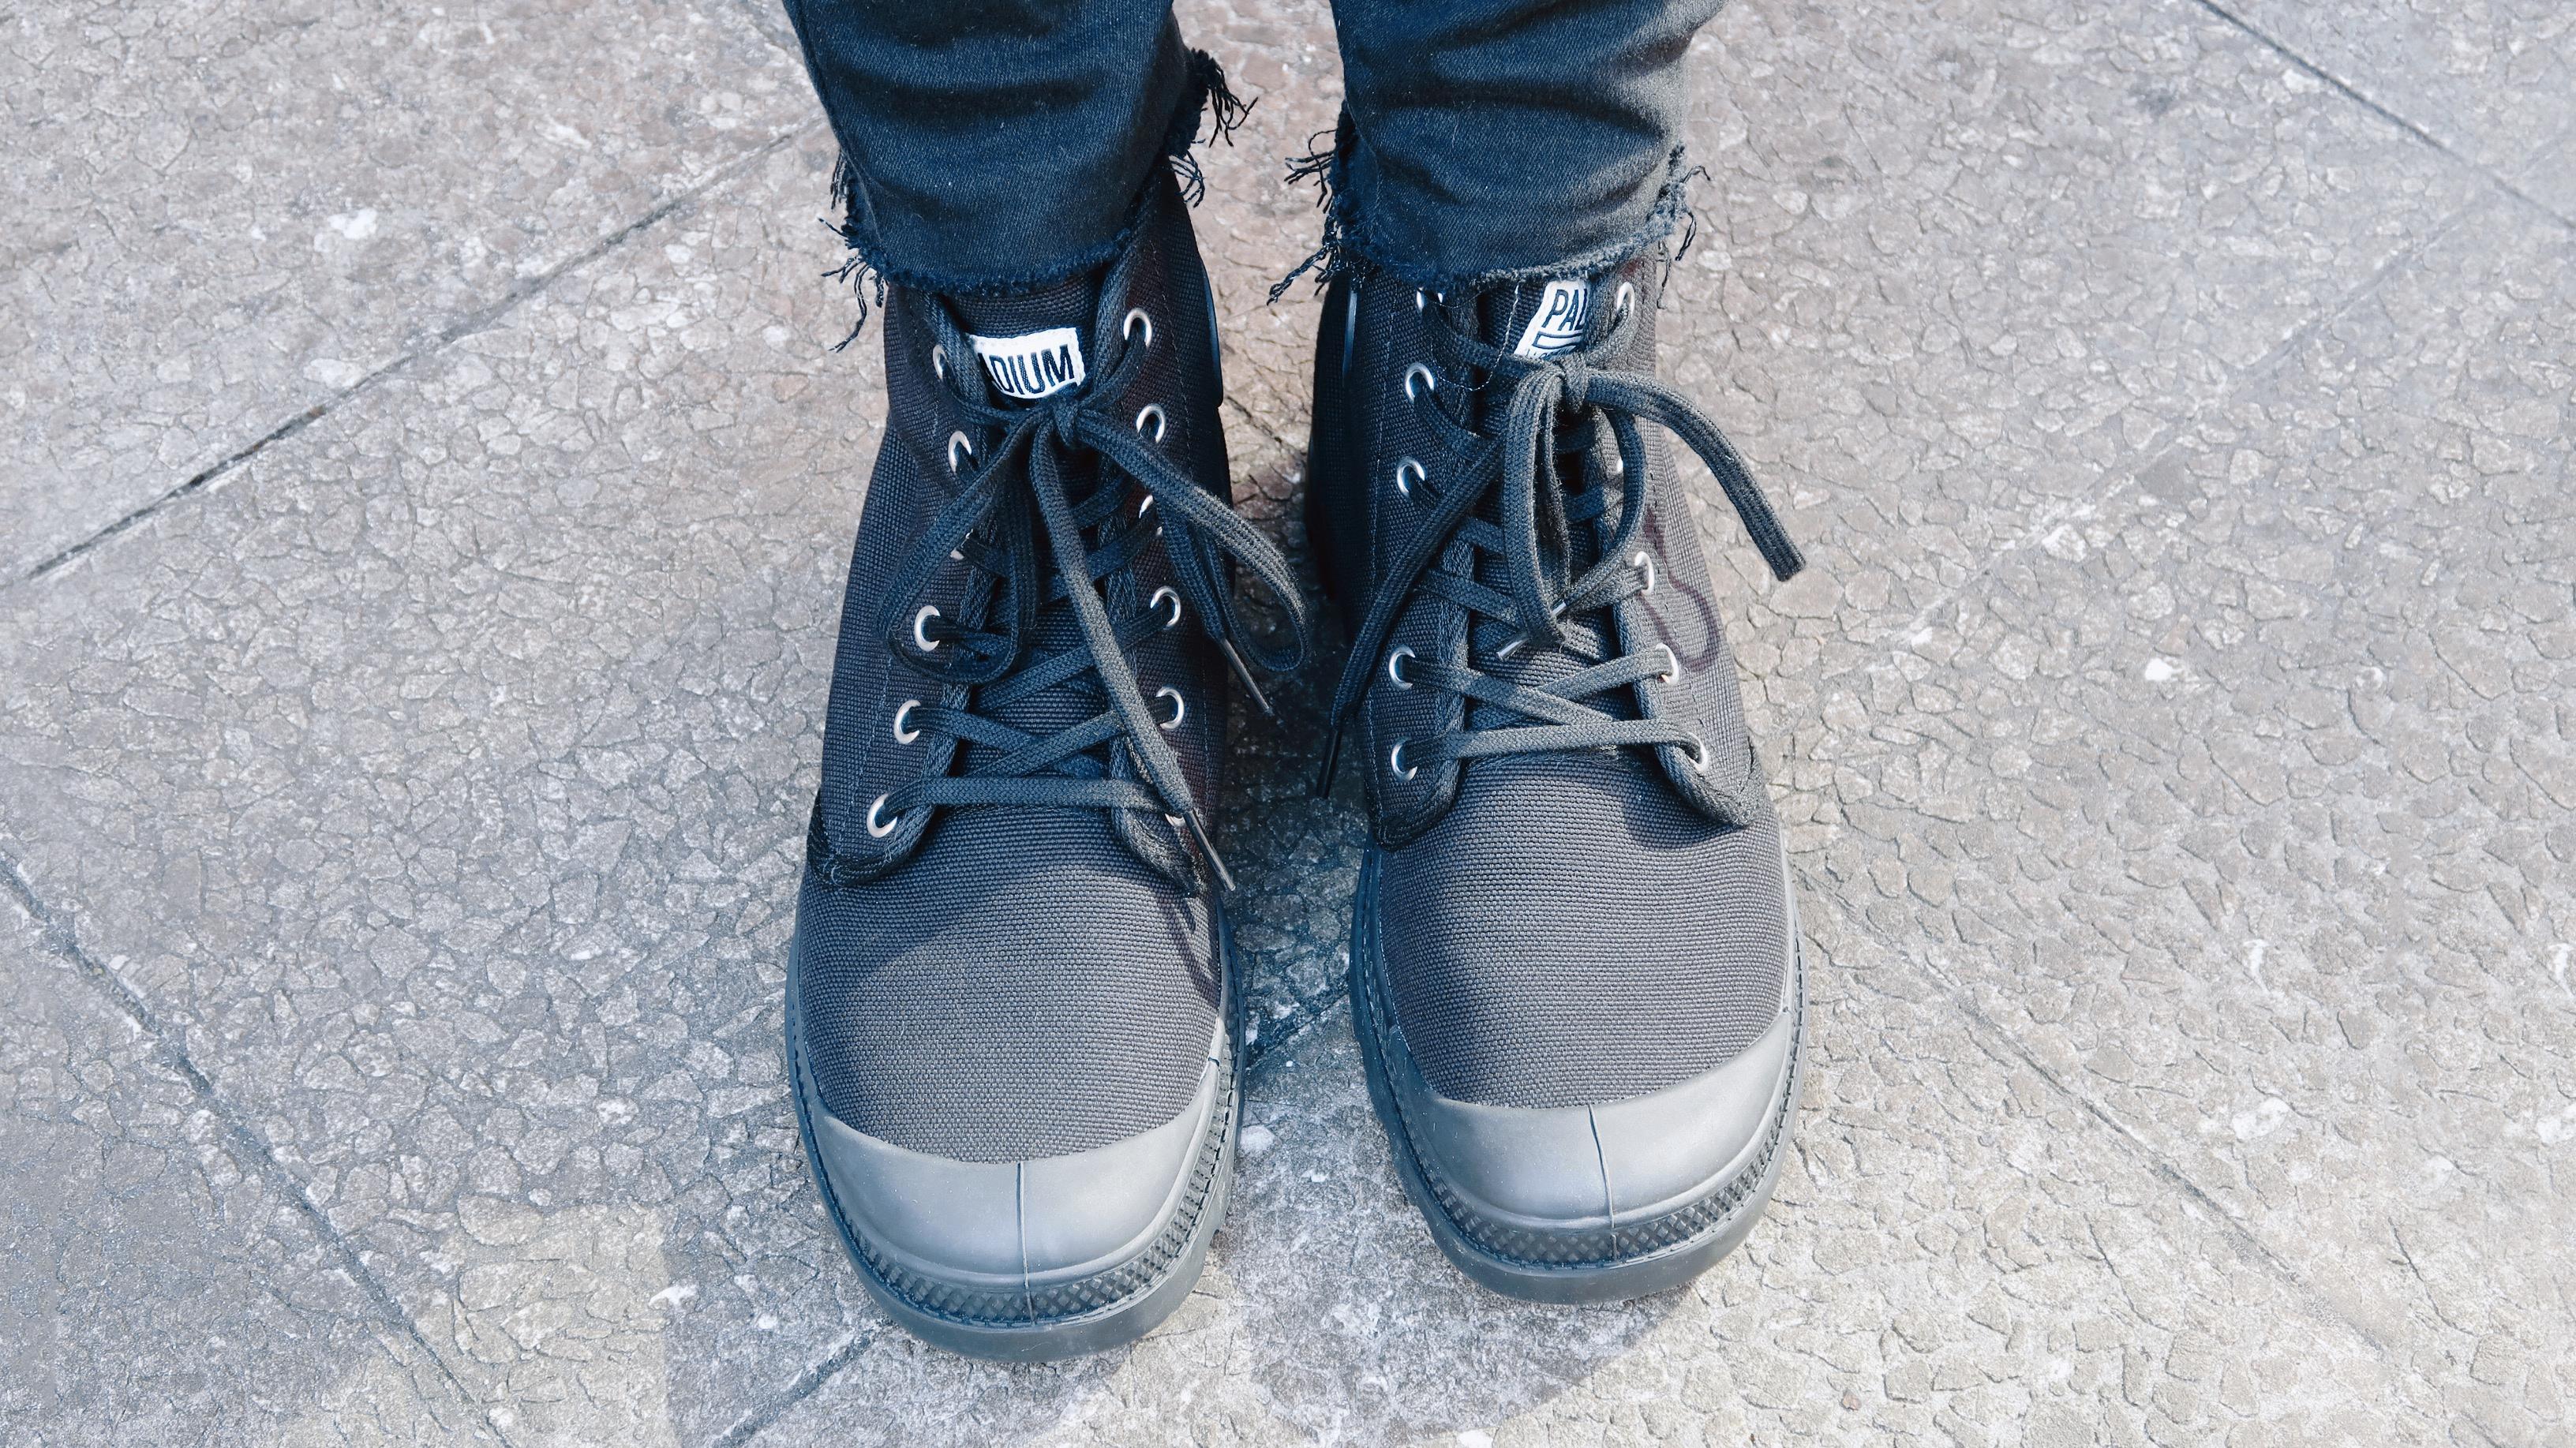 IMG_5_Palladium Boots.JPG